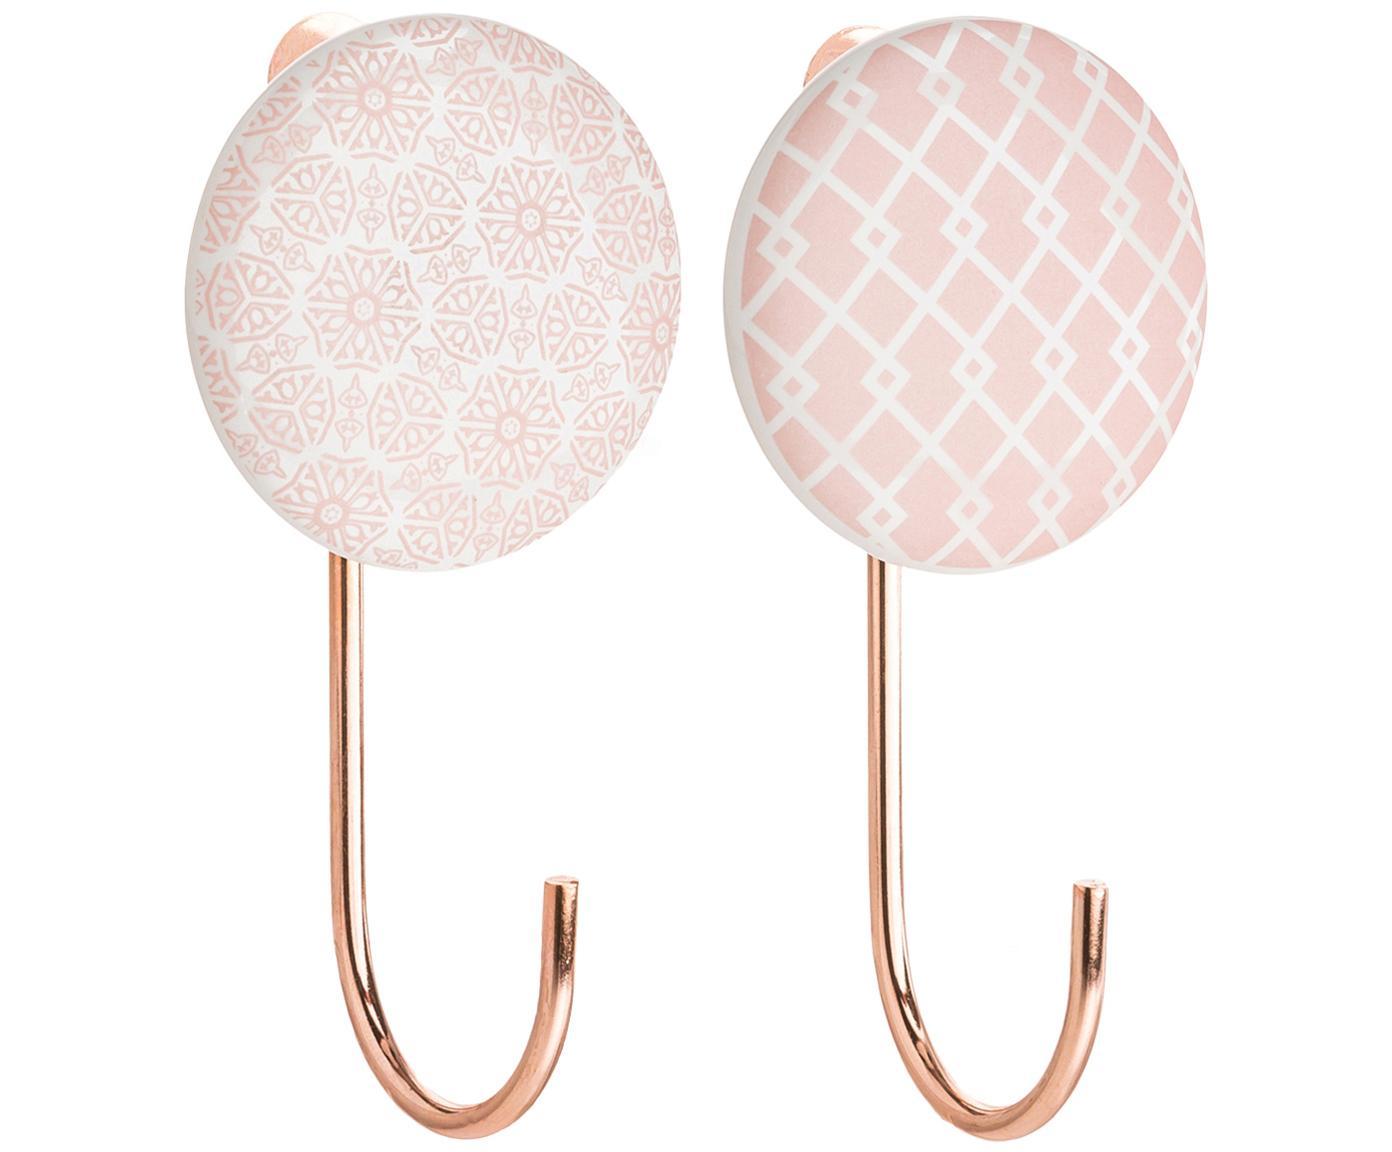 Set 2 ganci appendiabiti in ceramica Ariola, Gancio appendiabiti da parete: rosa, crema Dettagli: color rame, Lung. 11 x Larg. 6 cm